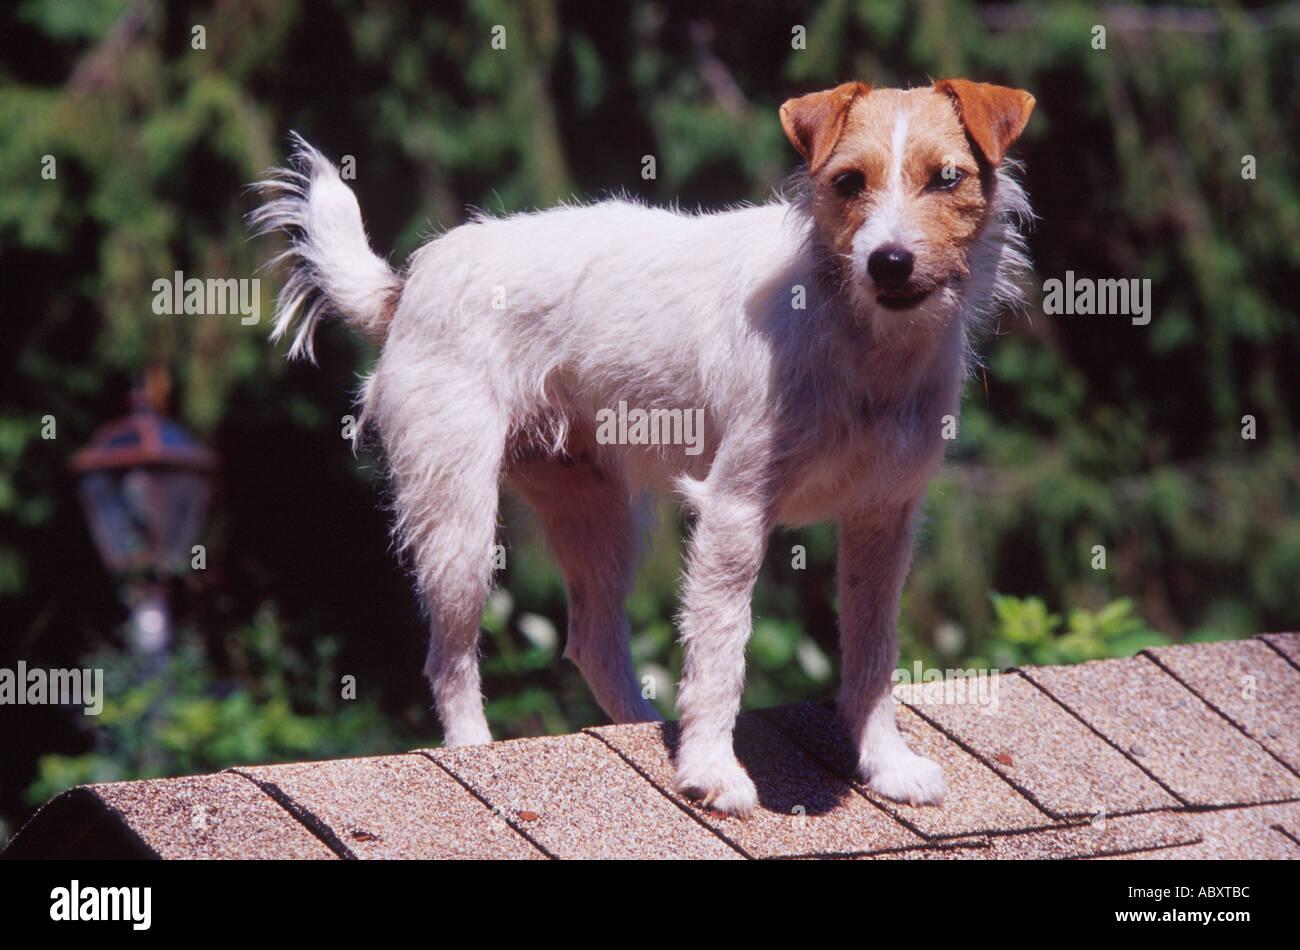 Tolle über Drahthaar Terrier Bilder - Elektrische Schaltplan-Ideen ...